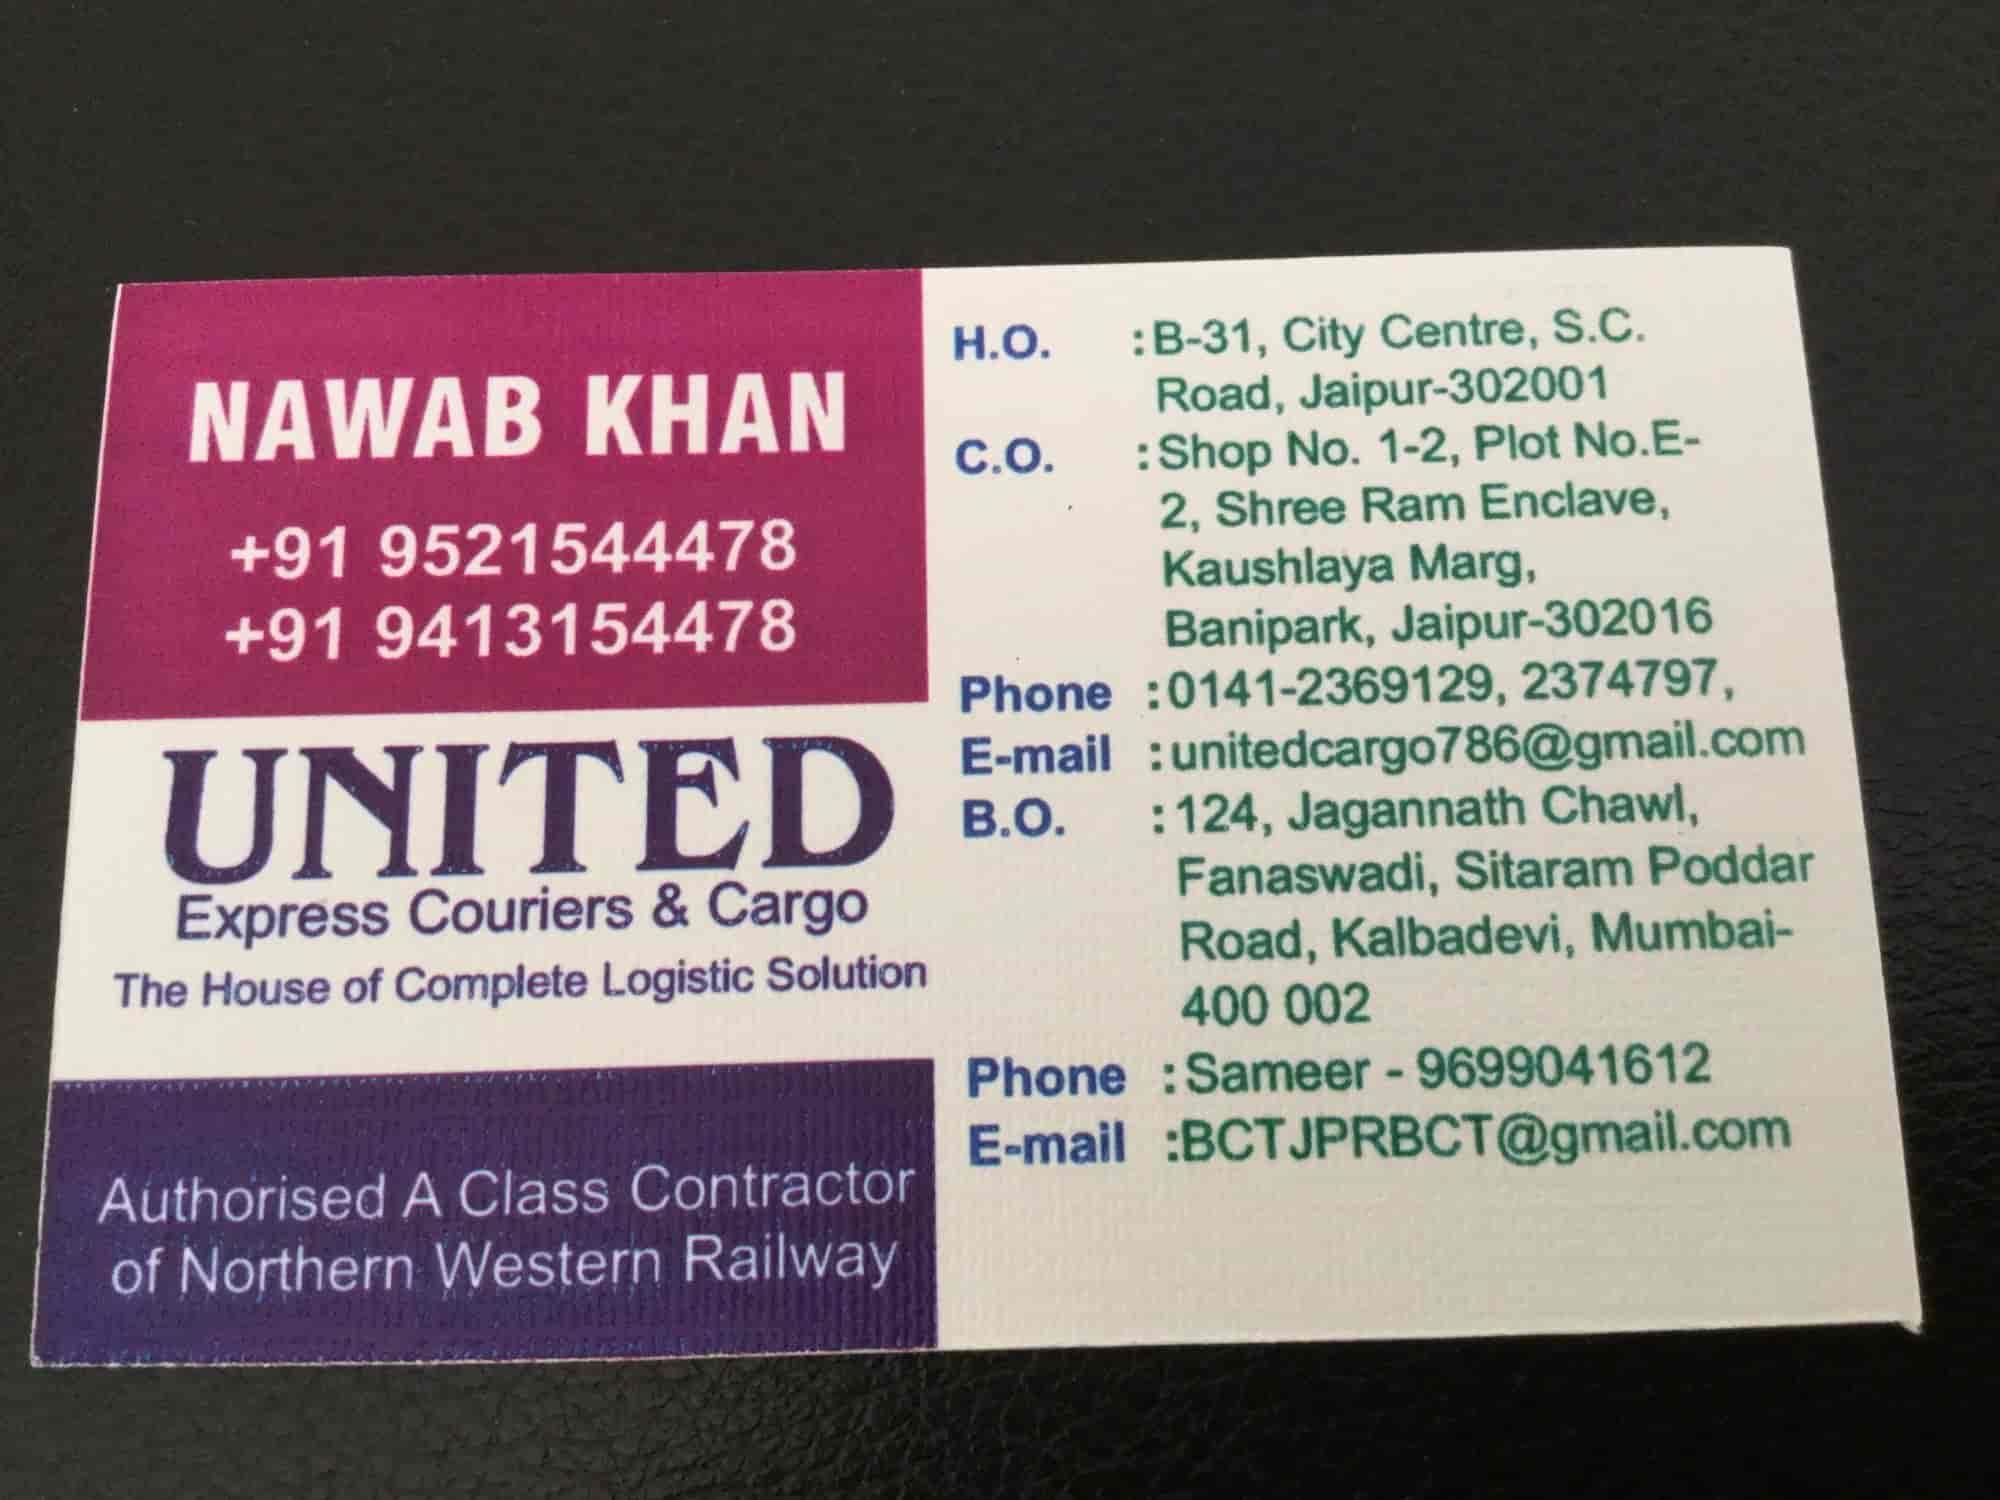 United Express Courier & Cargo, Sansar Chand Road - Cargo